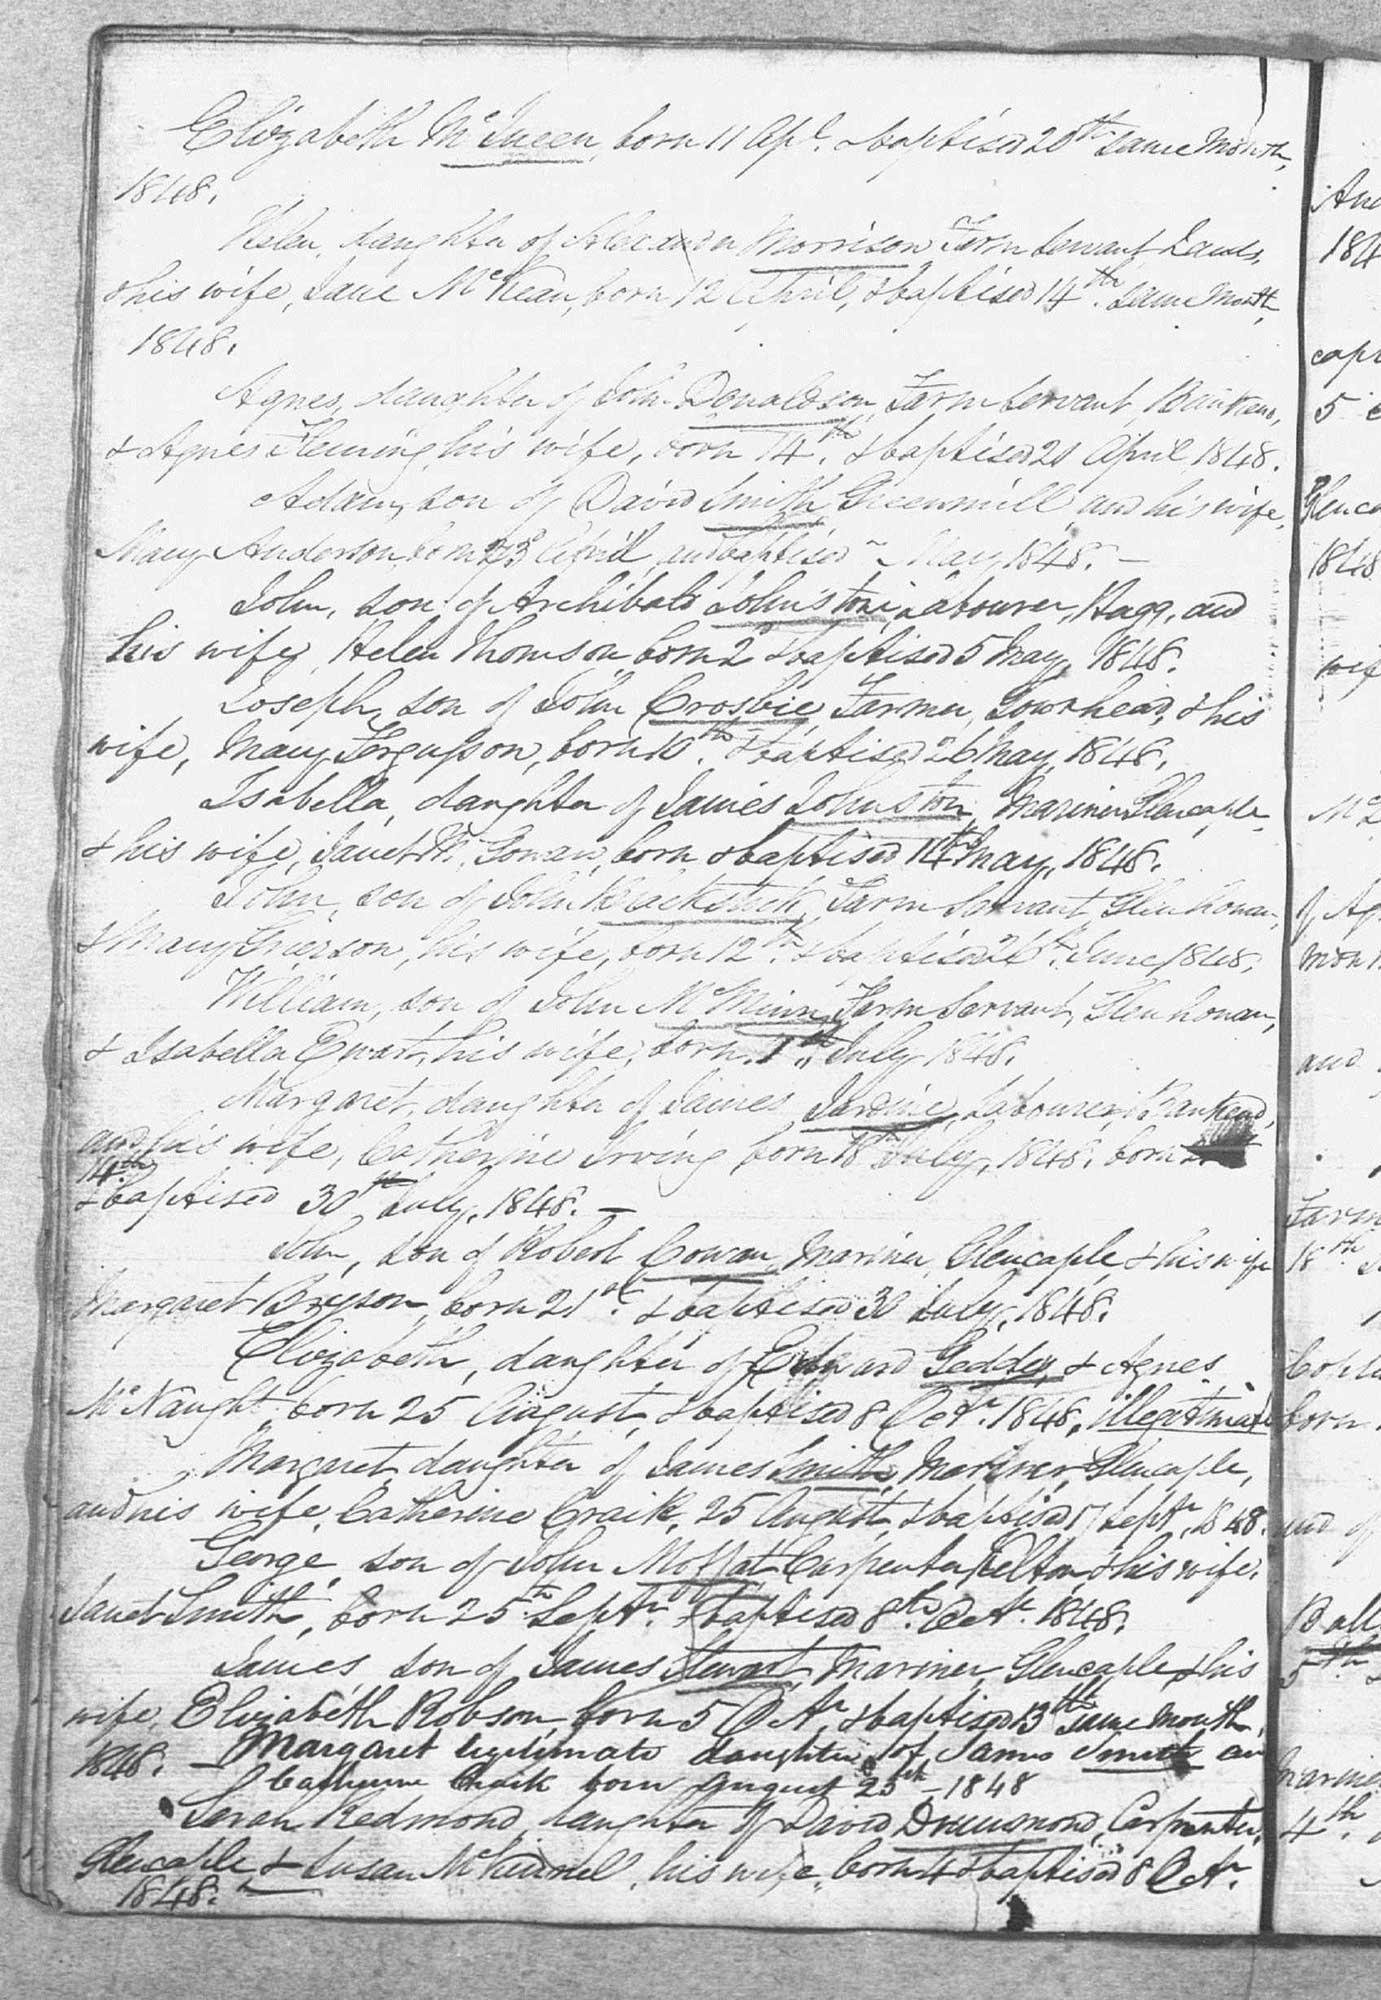 james-stewart-1848-web.jpg